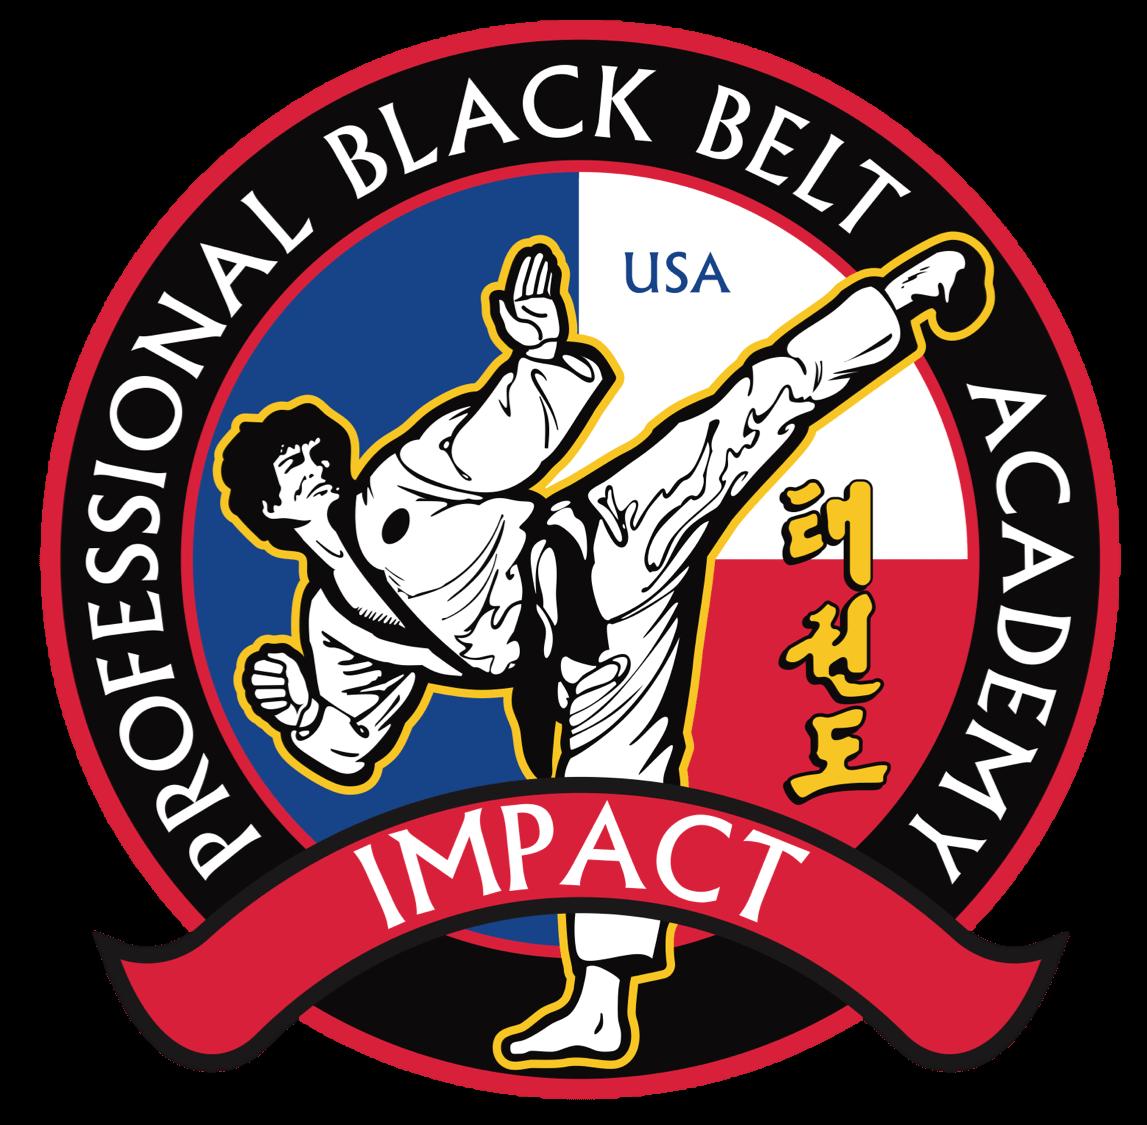 Karate clipart black belt karate. Impact martial arts classes